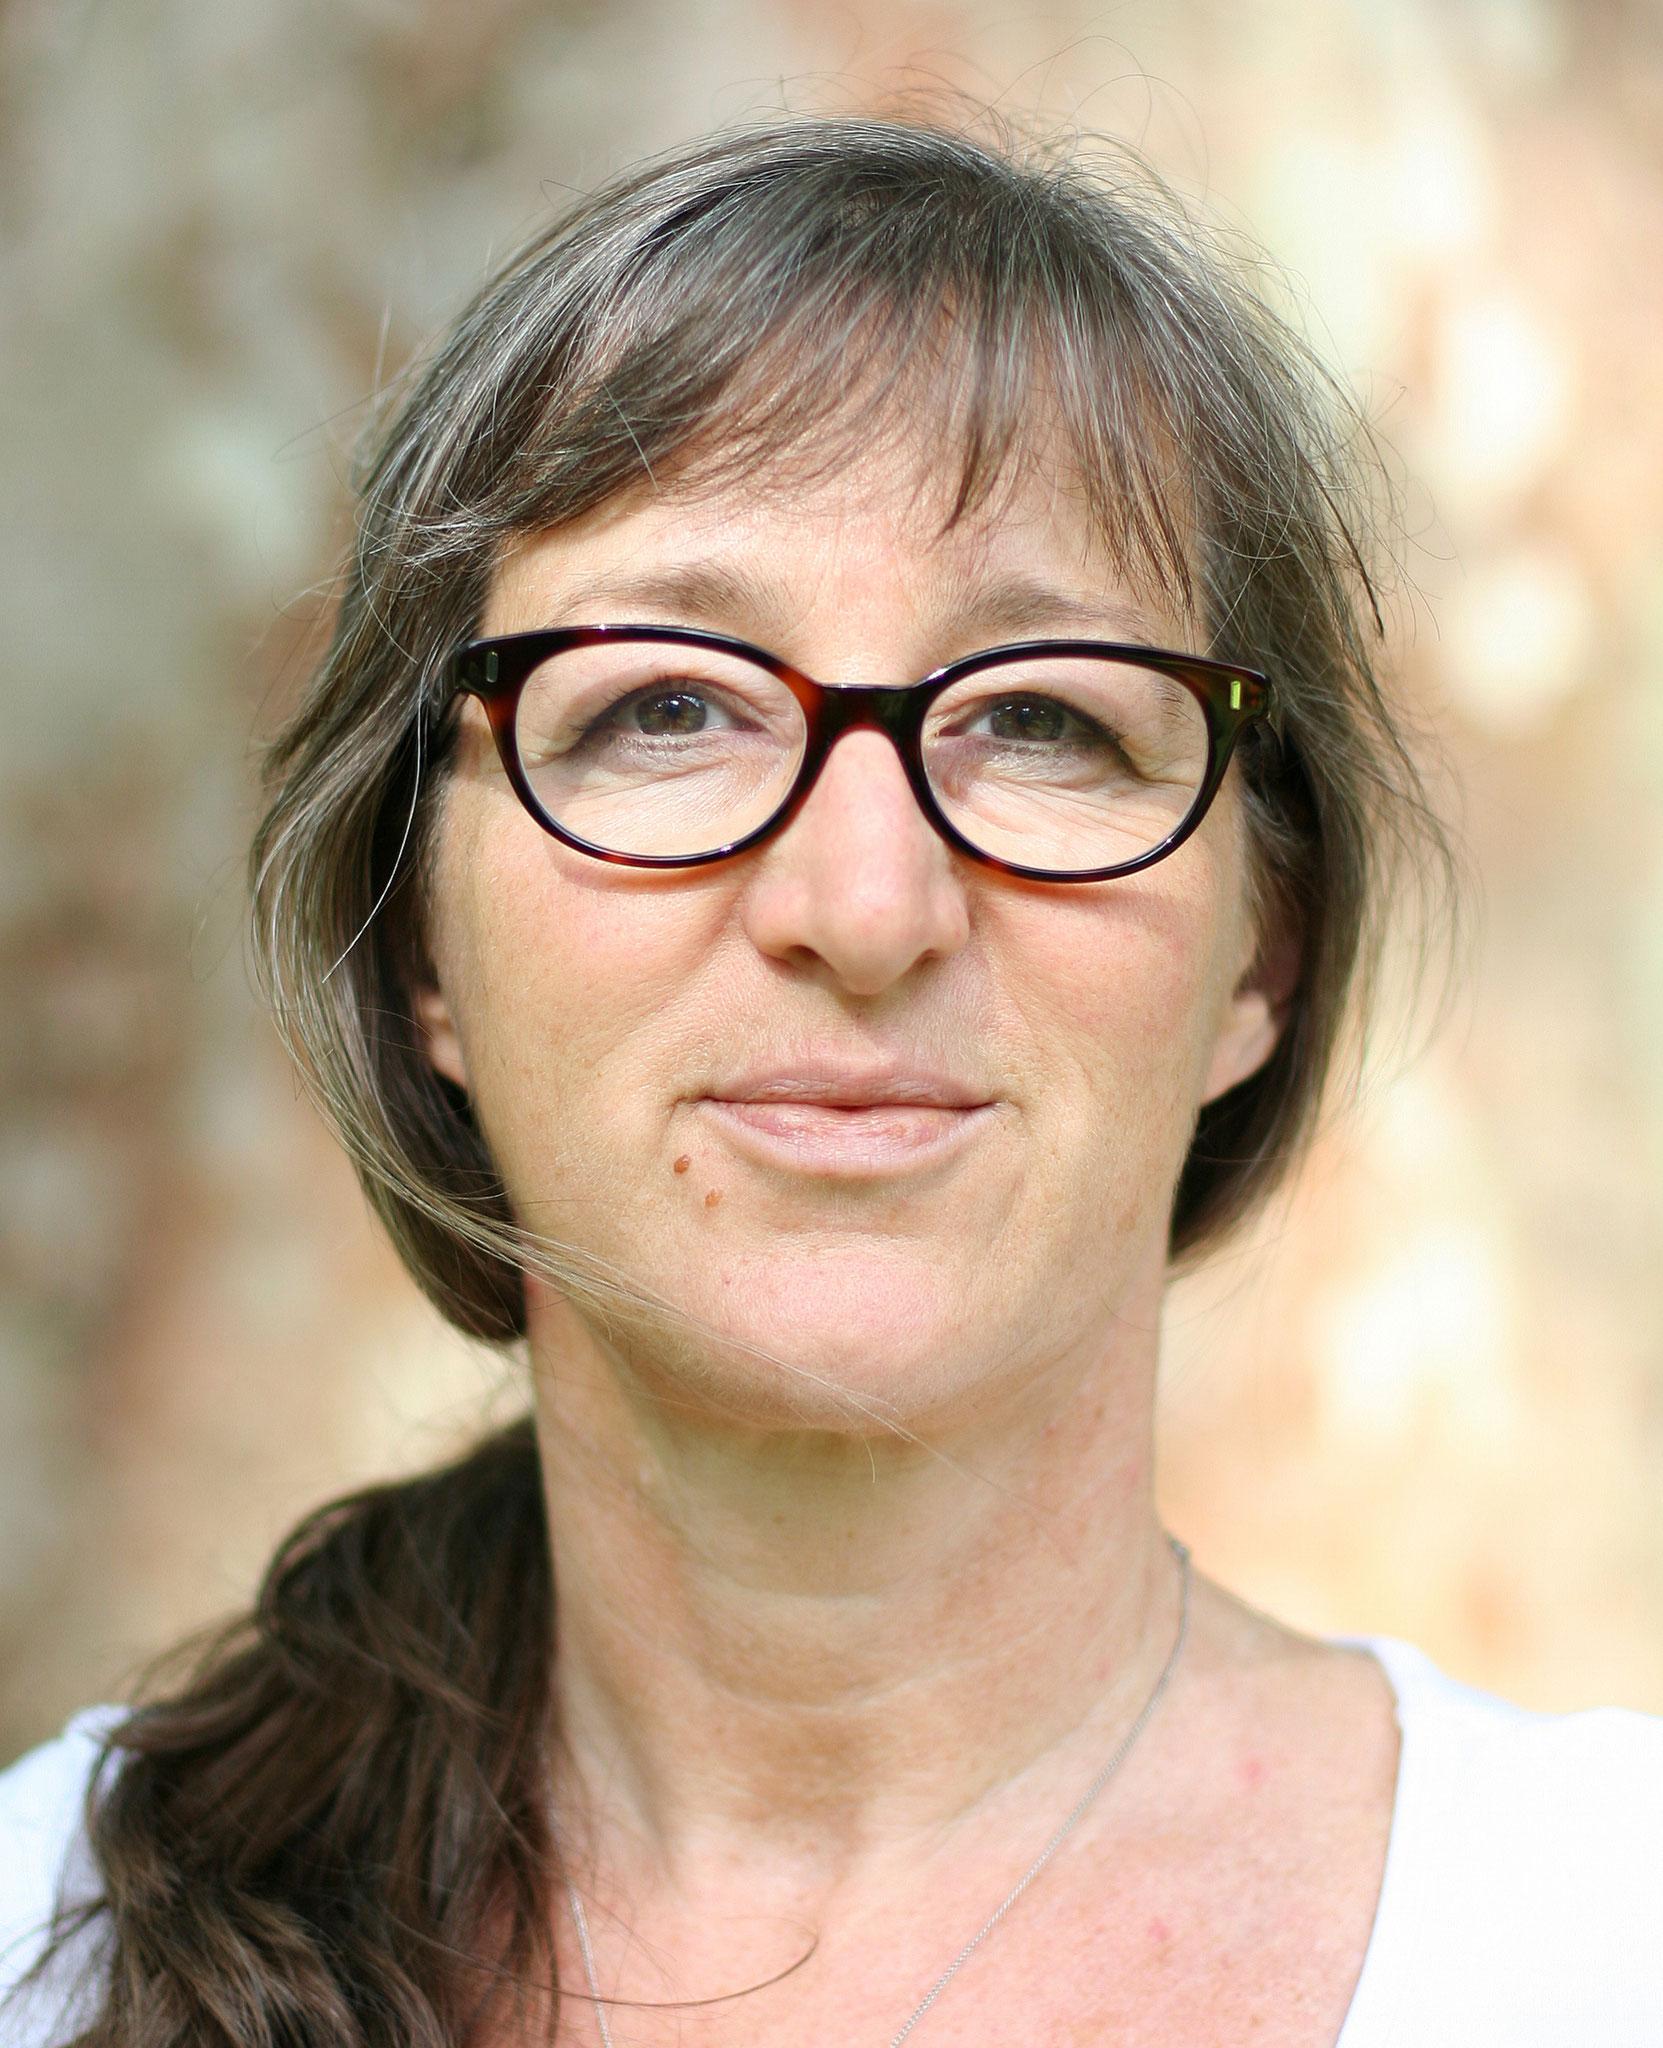 Hebammenpraxis 37, Judith Kulesza, Hebamme, Yogalehrerin, Heilpraktikerin, Fortbildungen